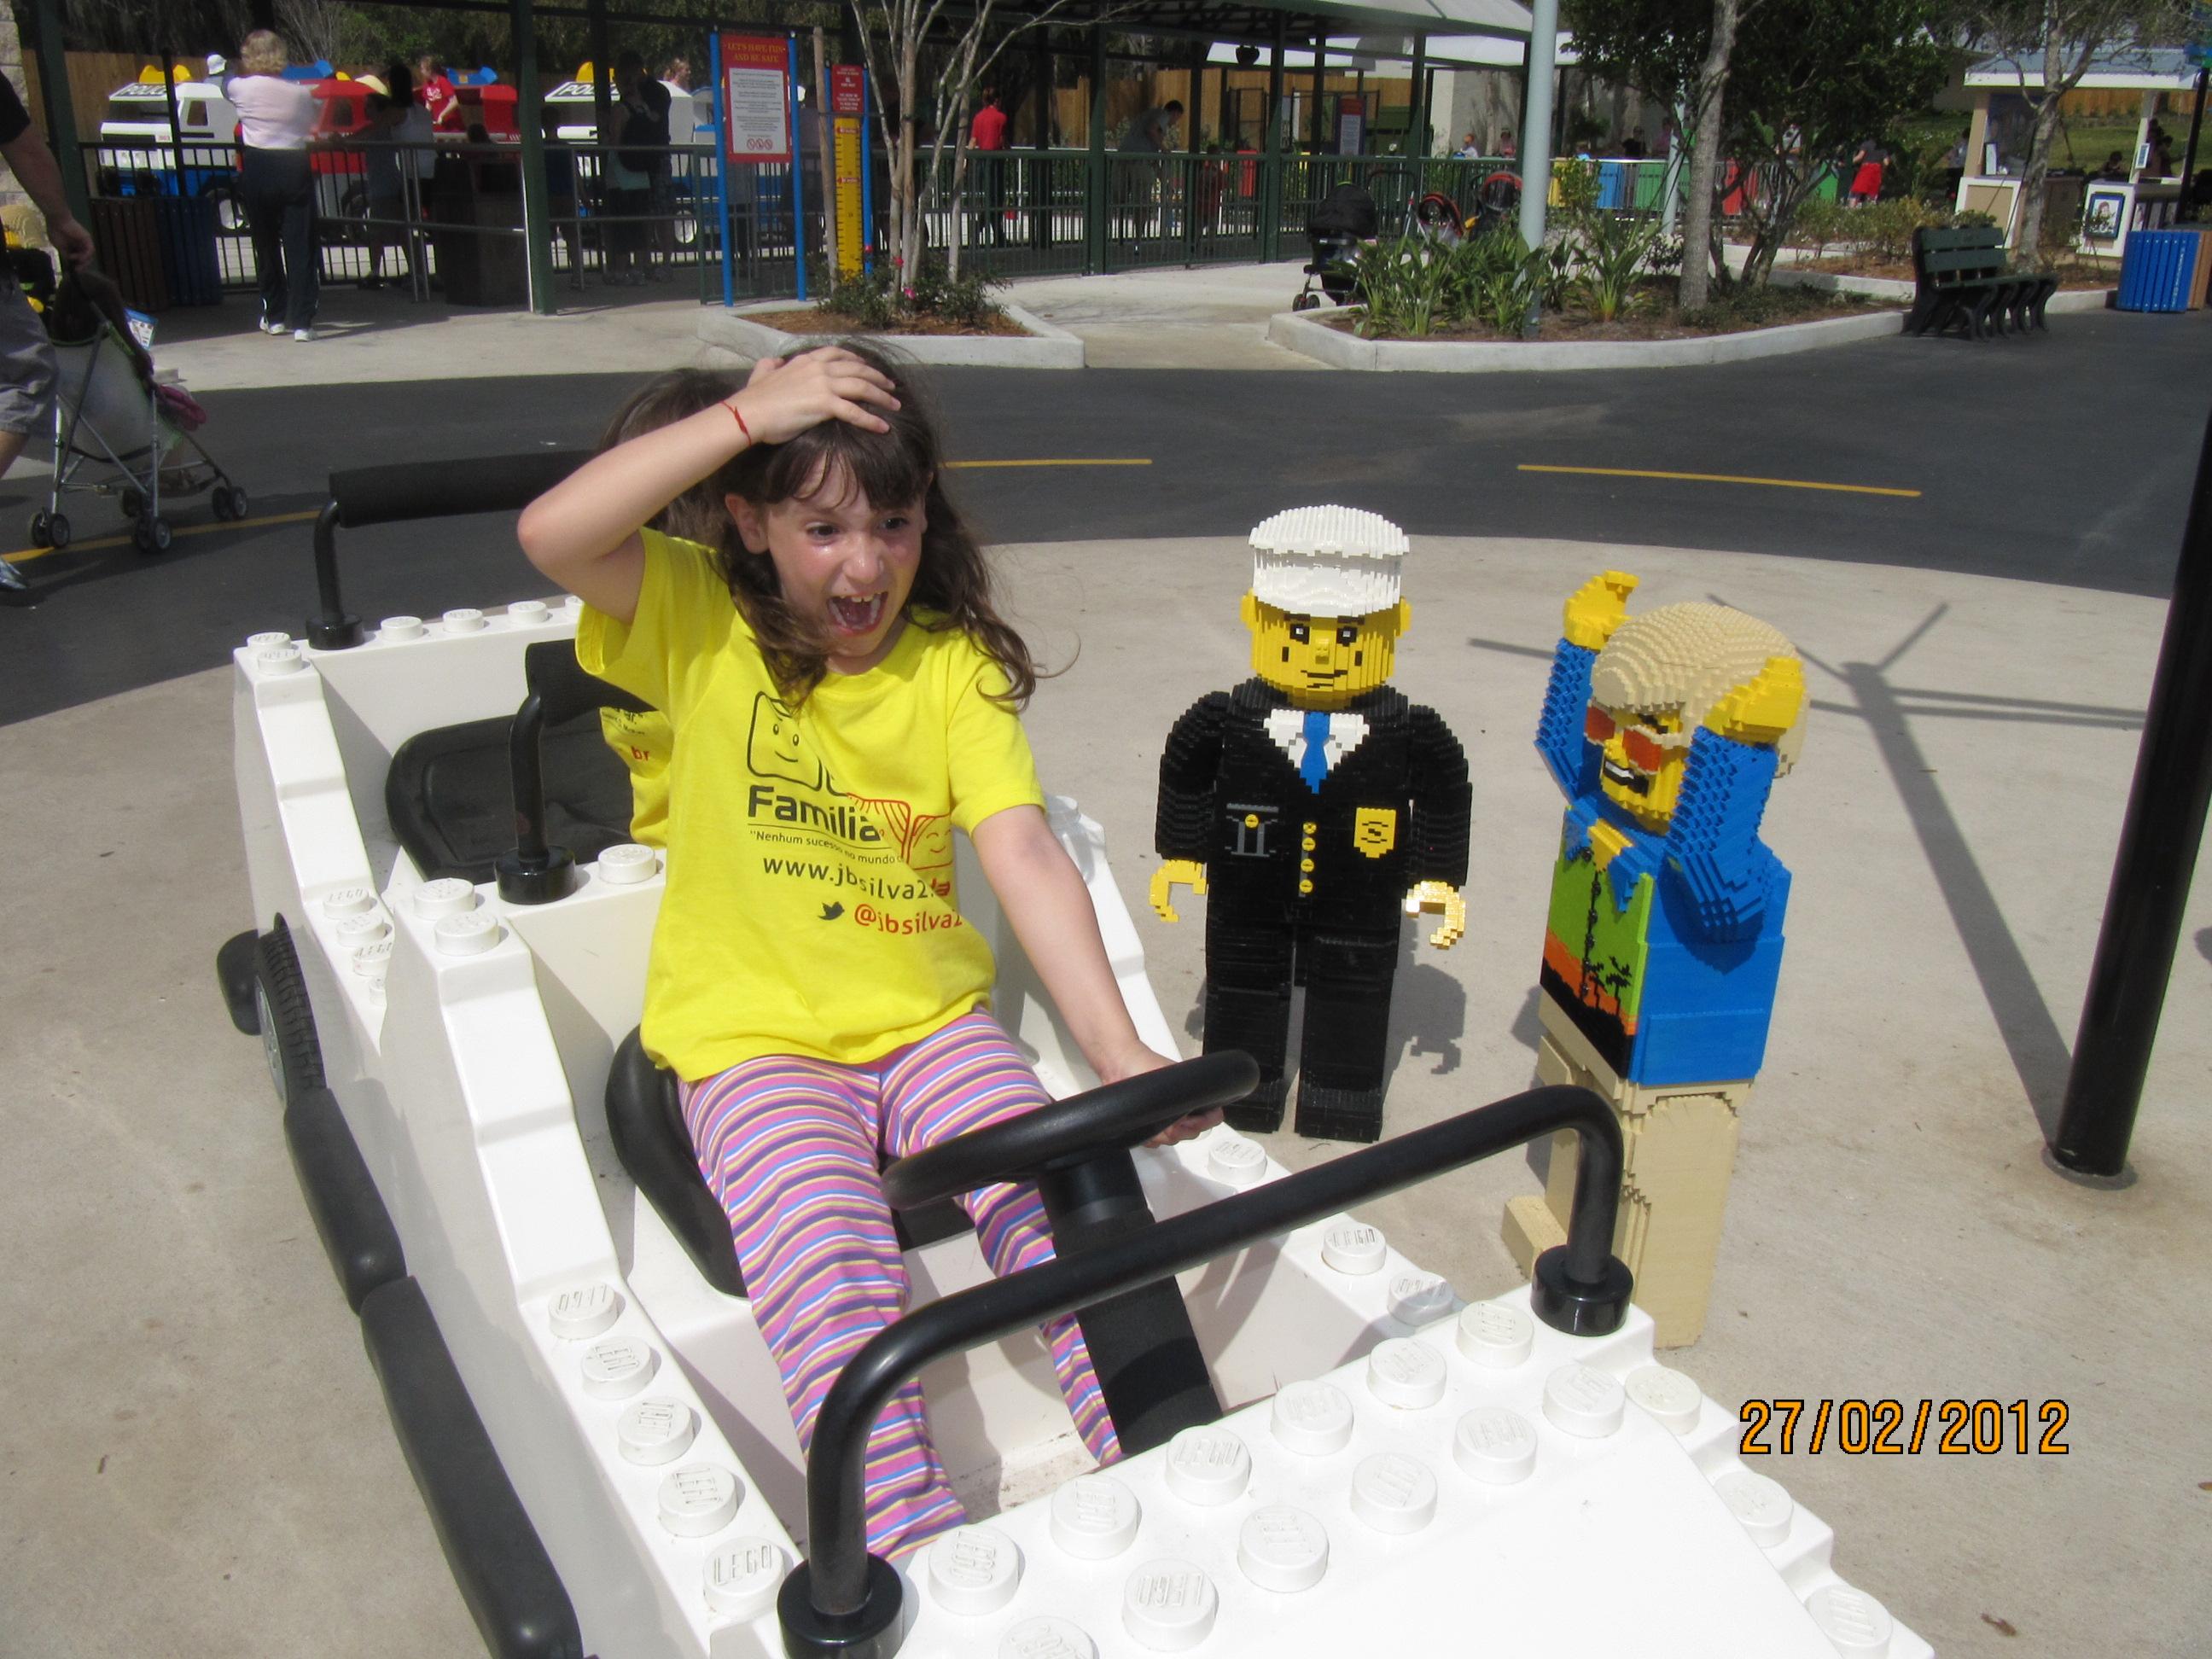 Amanda bateu com o carro na Legolândia!